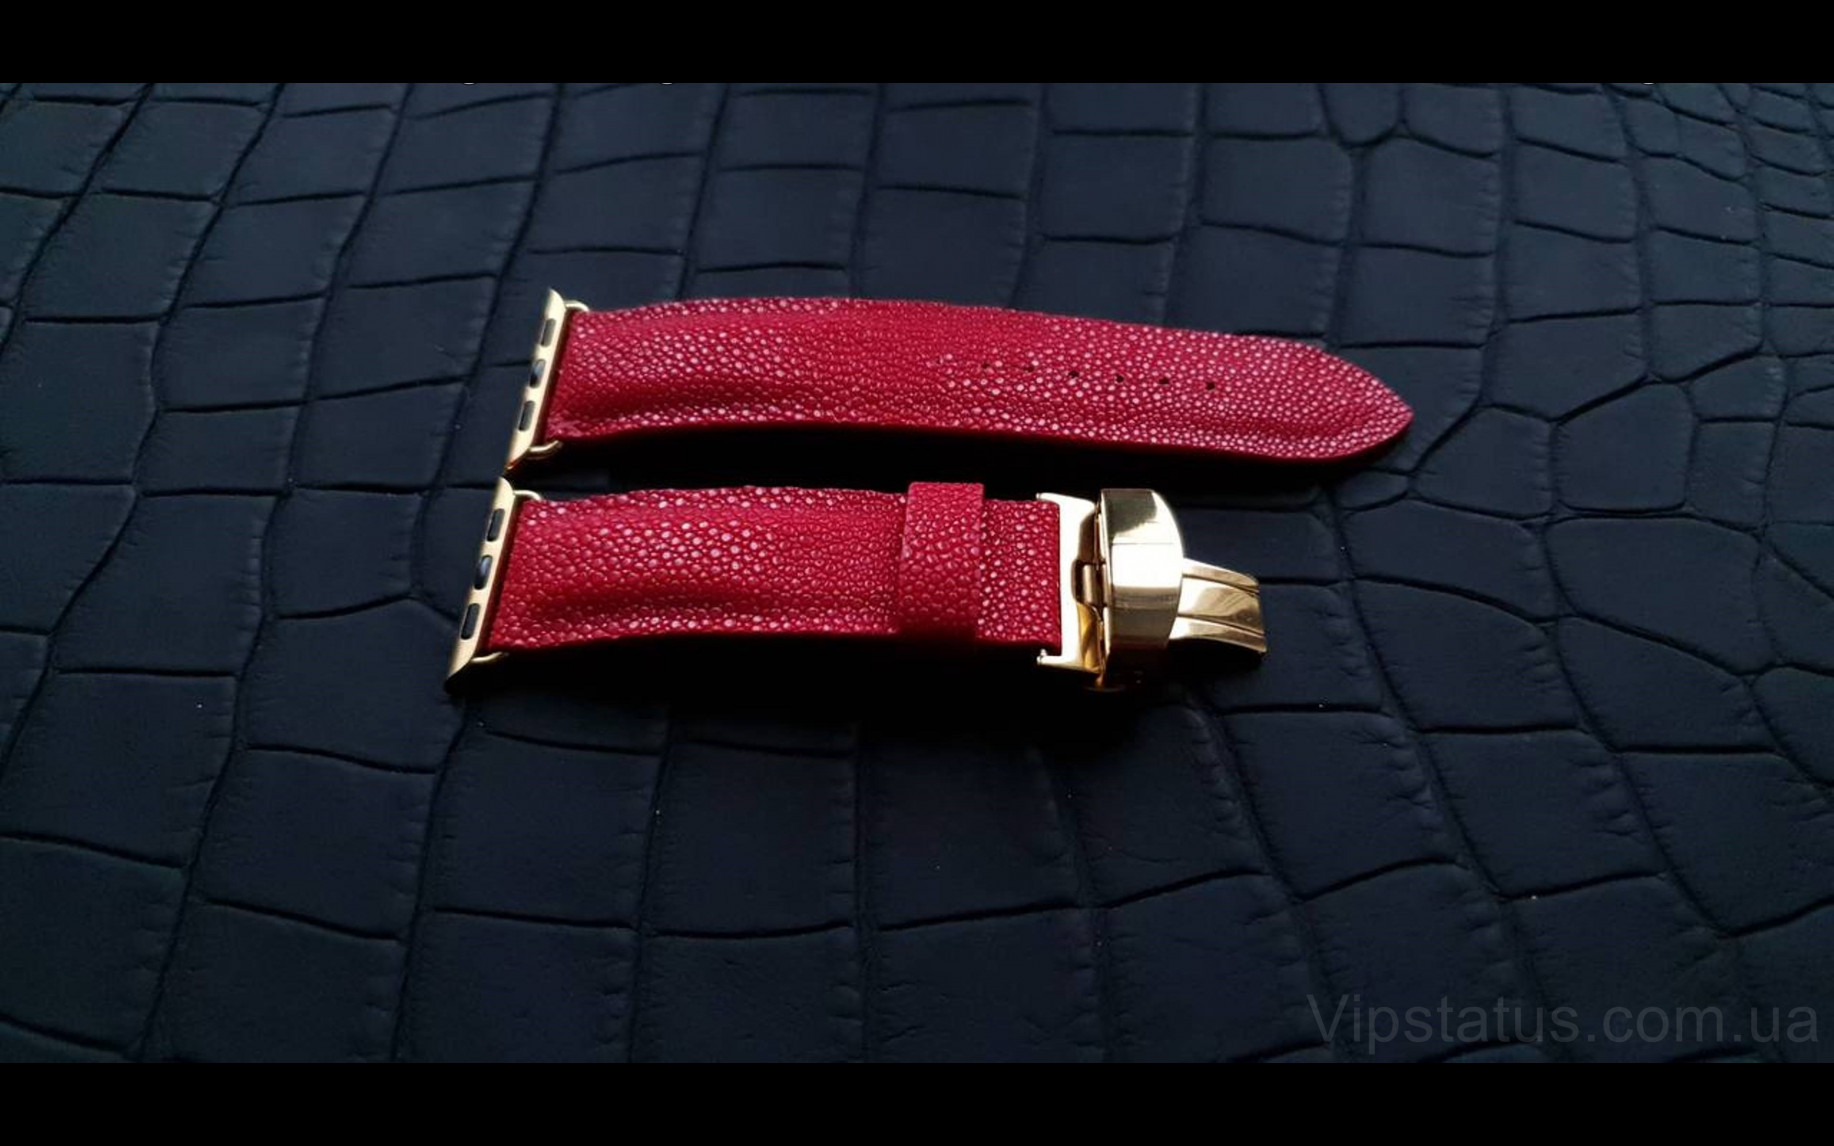 Elite Премиум ремешок для часов Tiffany кожа ската Premium Stingray Leather Strap for Tiffany watches image 2